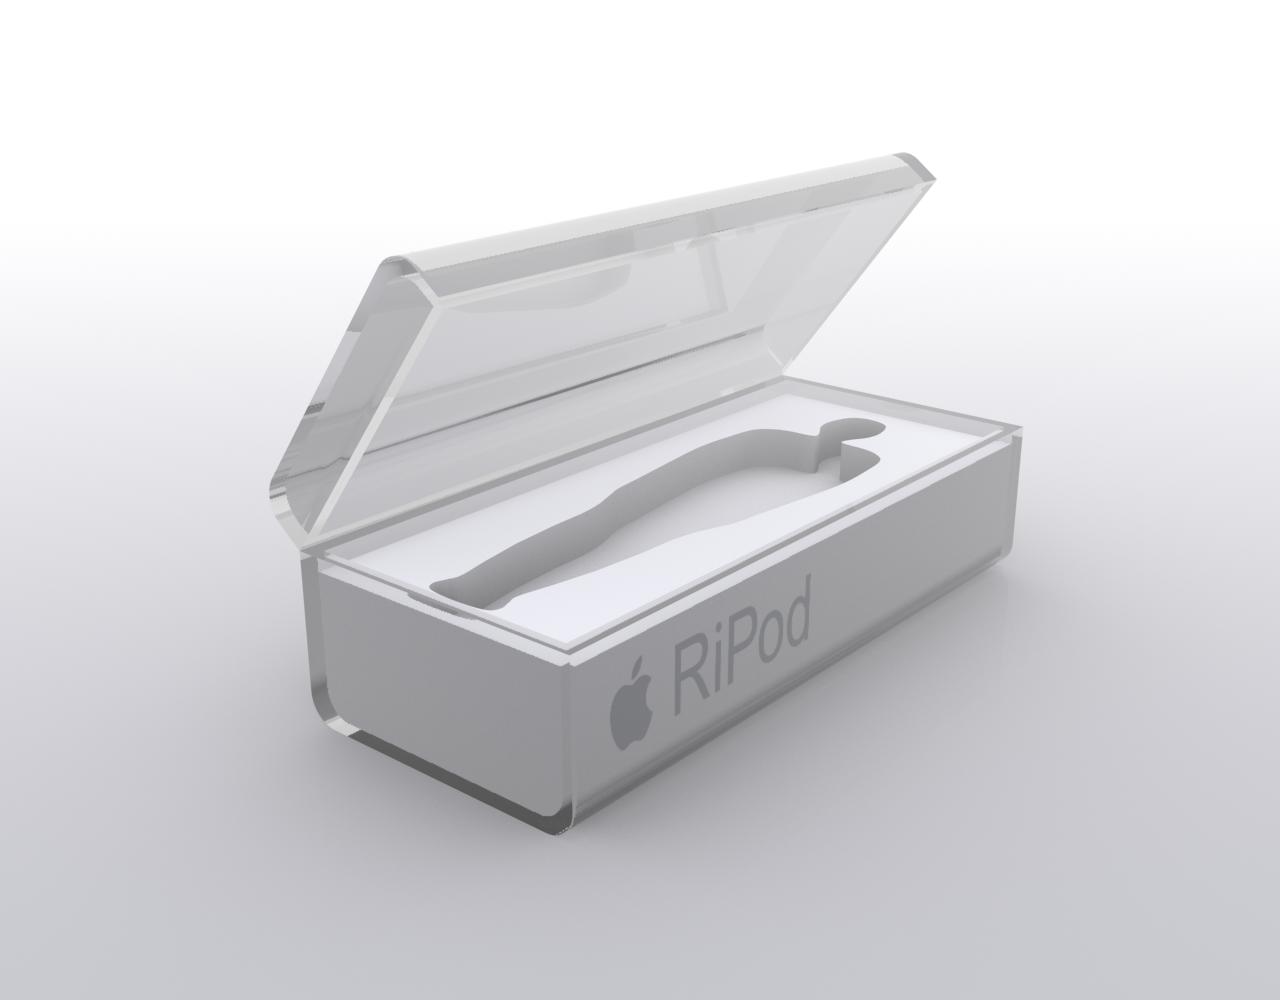 Steve Jobs RiPod